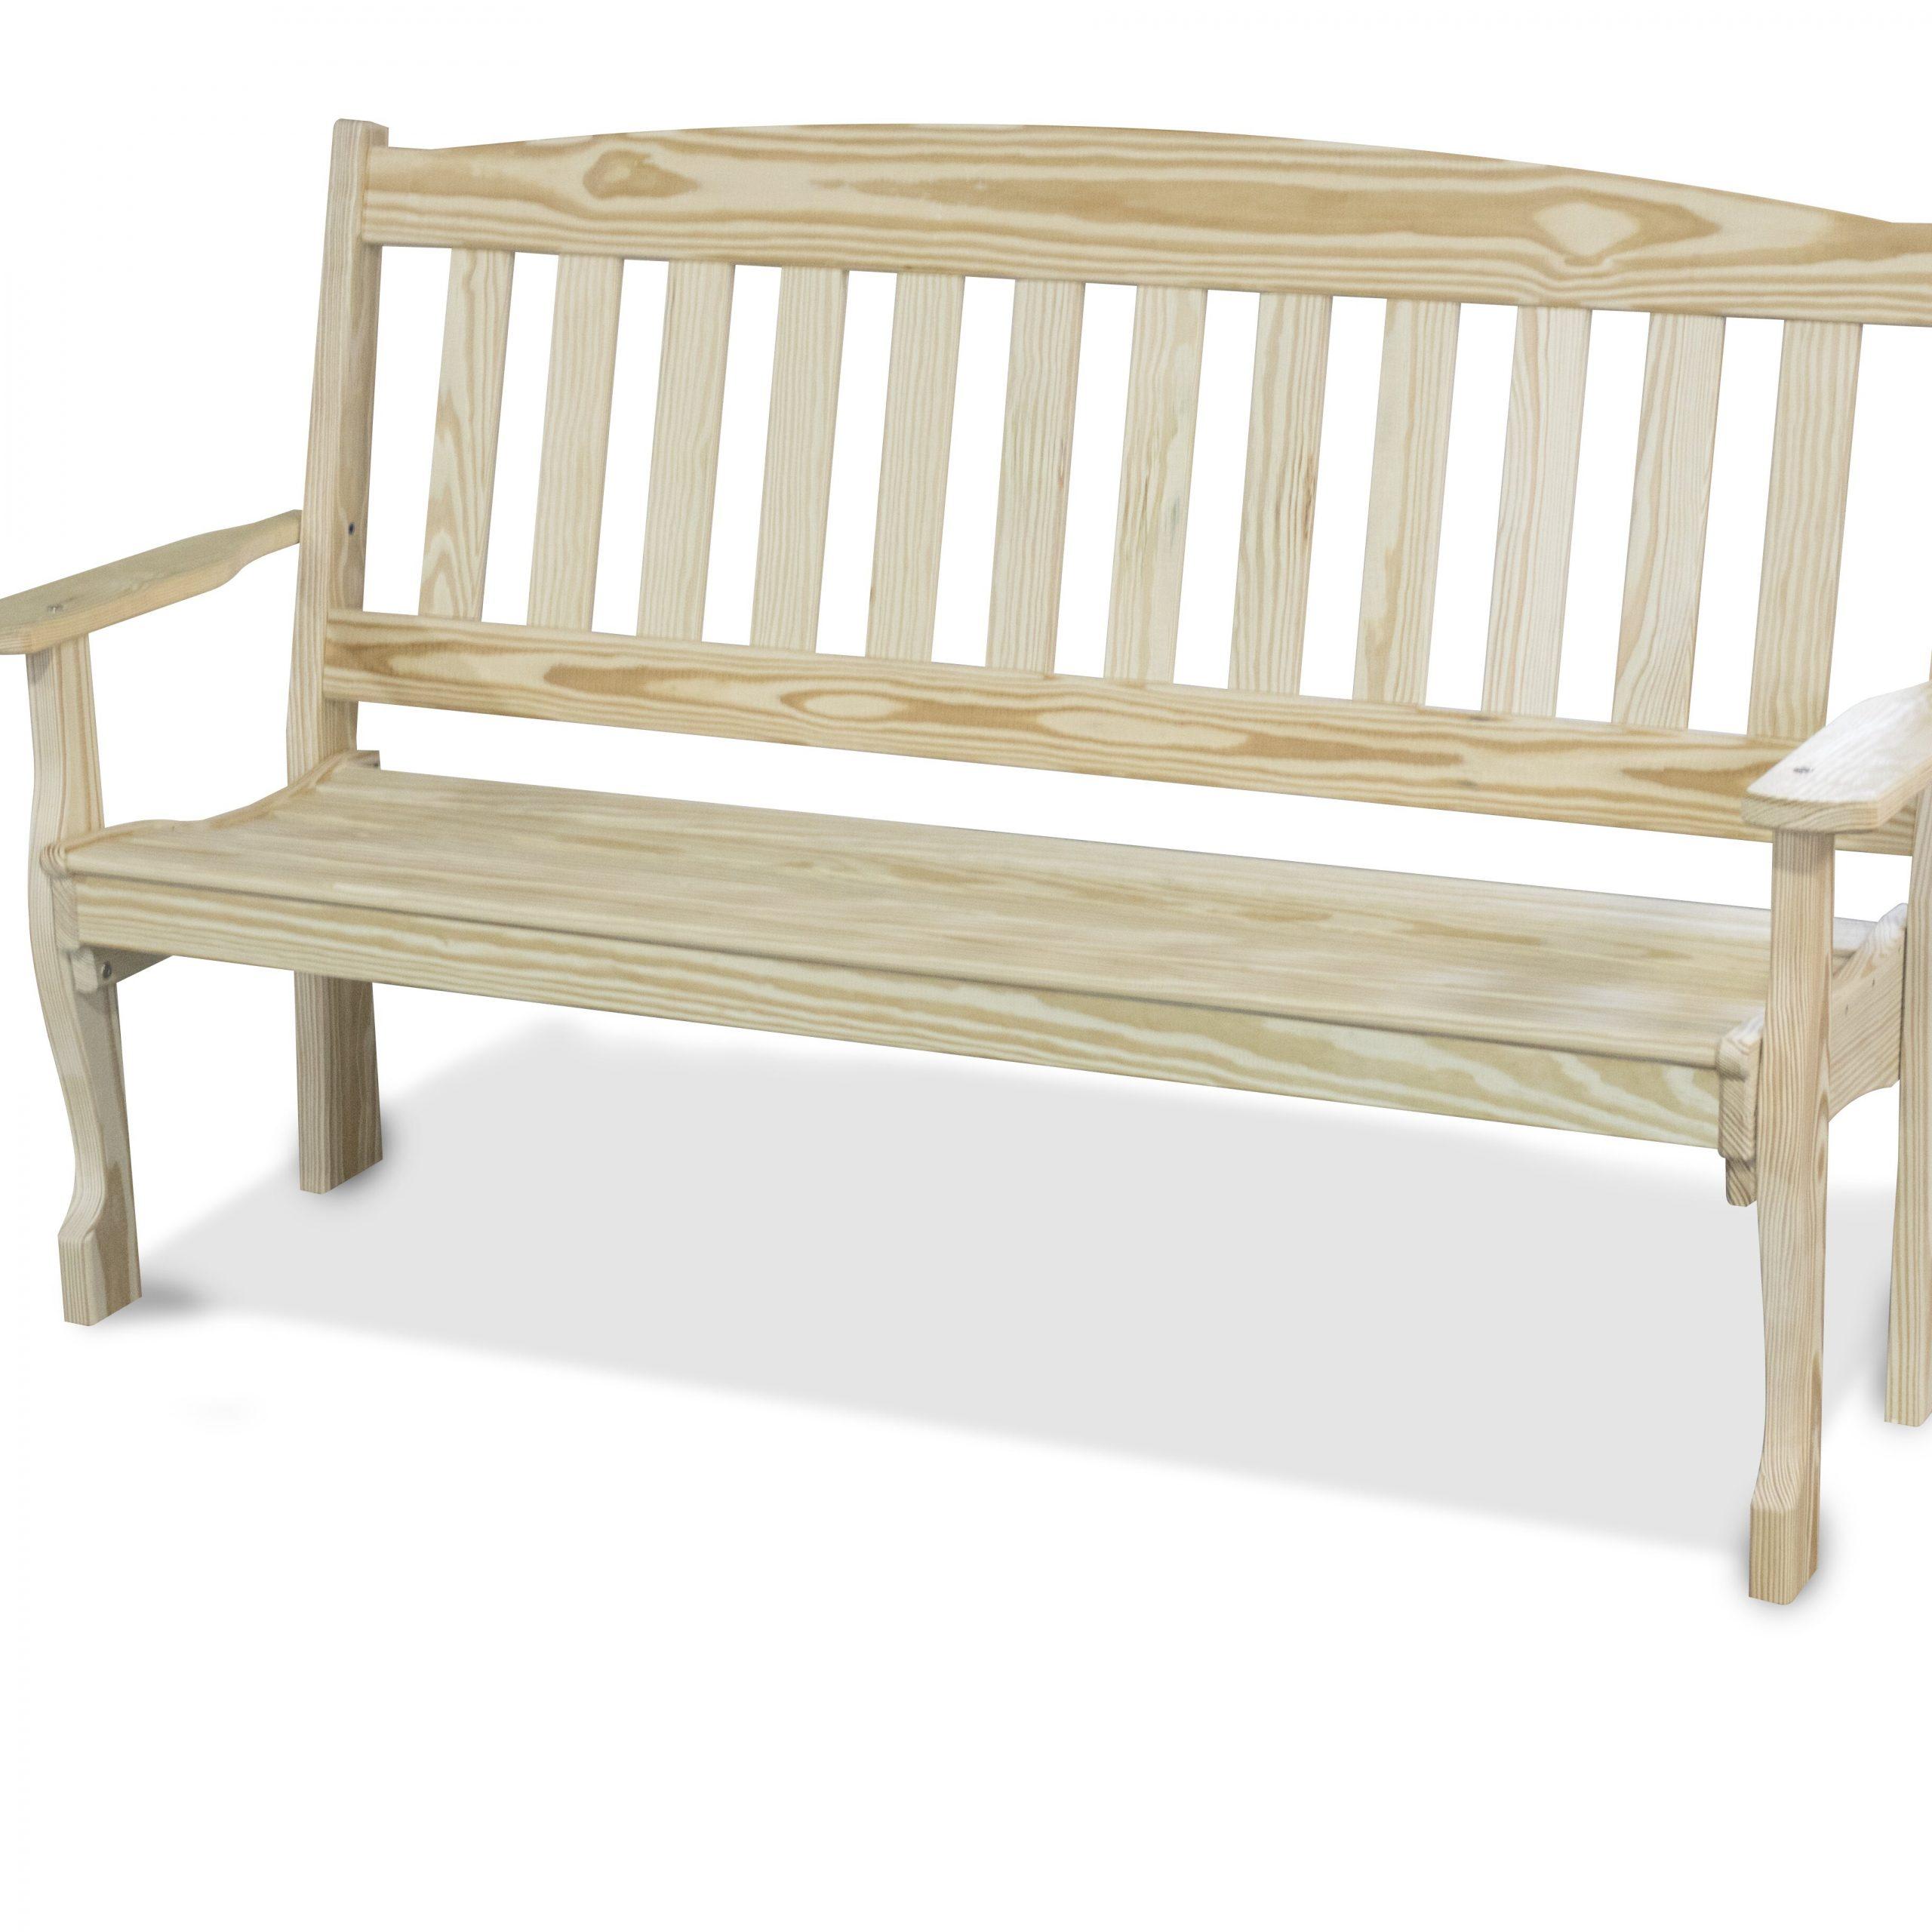 Wooden Garden Bench For Harpersfield Wooden Garden Benches (View 9 of 25)